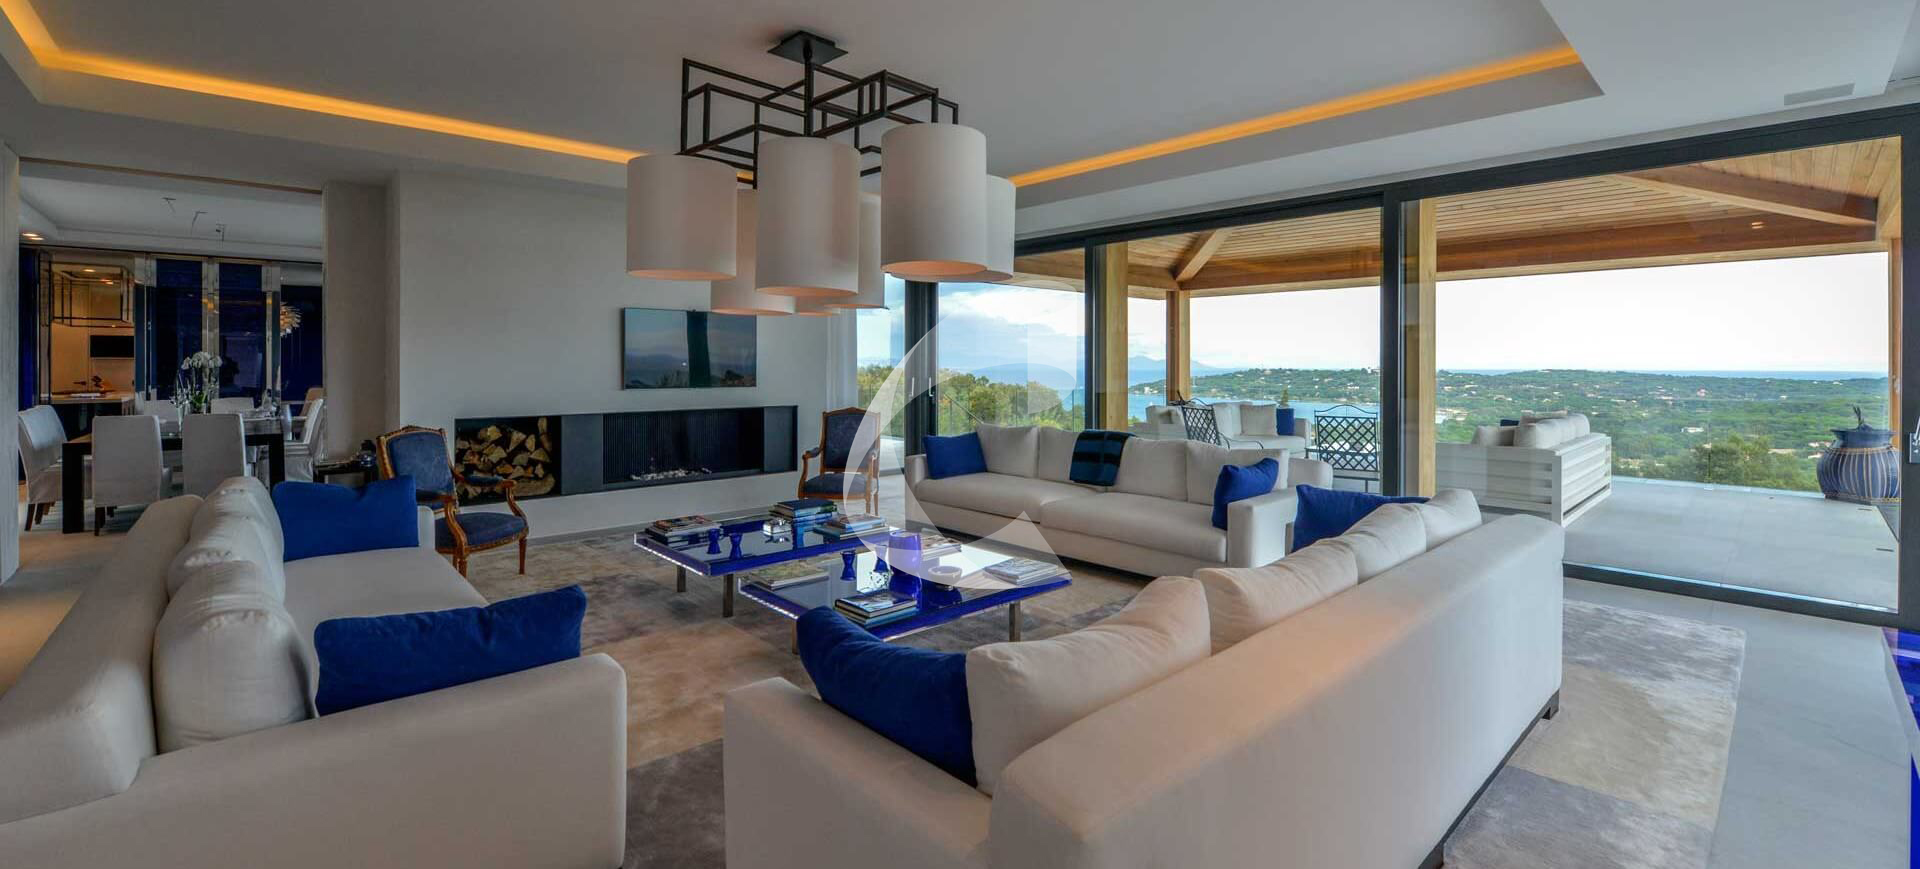 Villa rental Saint-Tropez Indigo